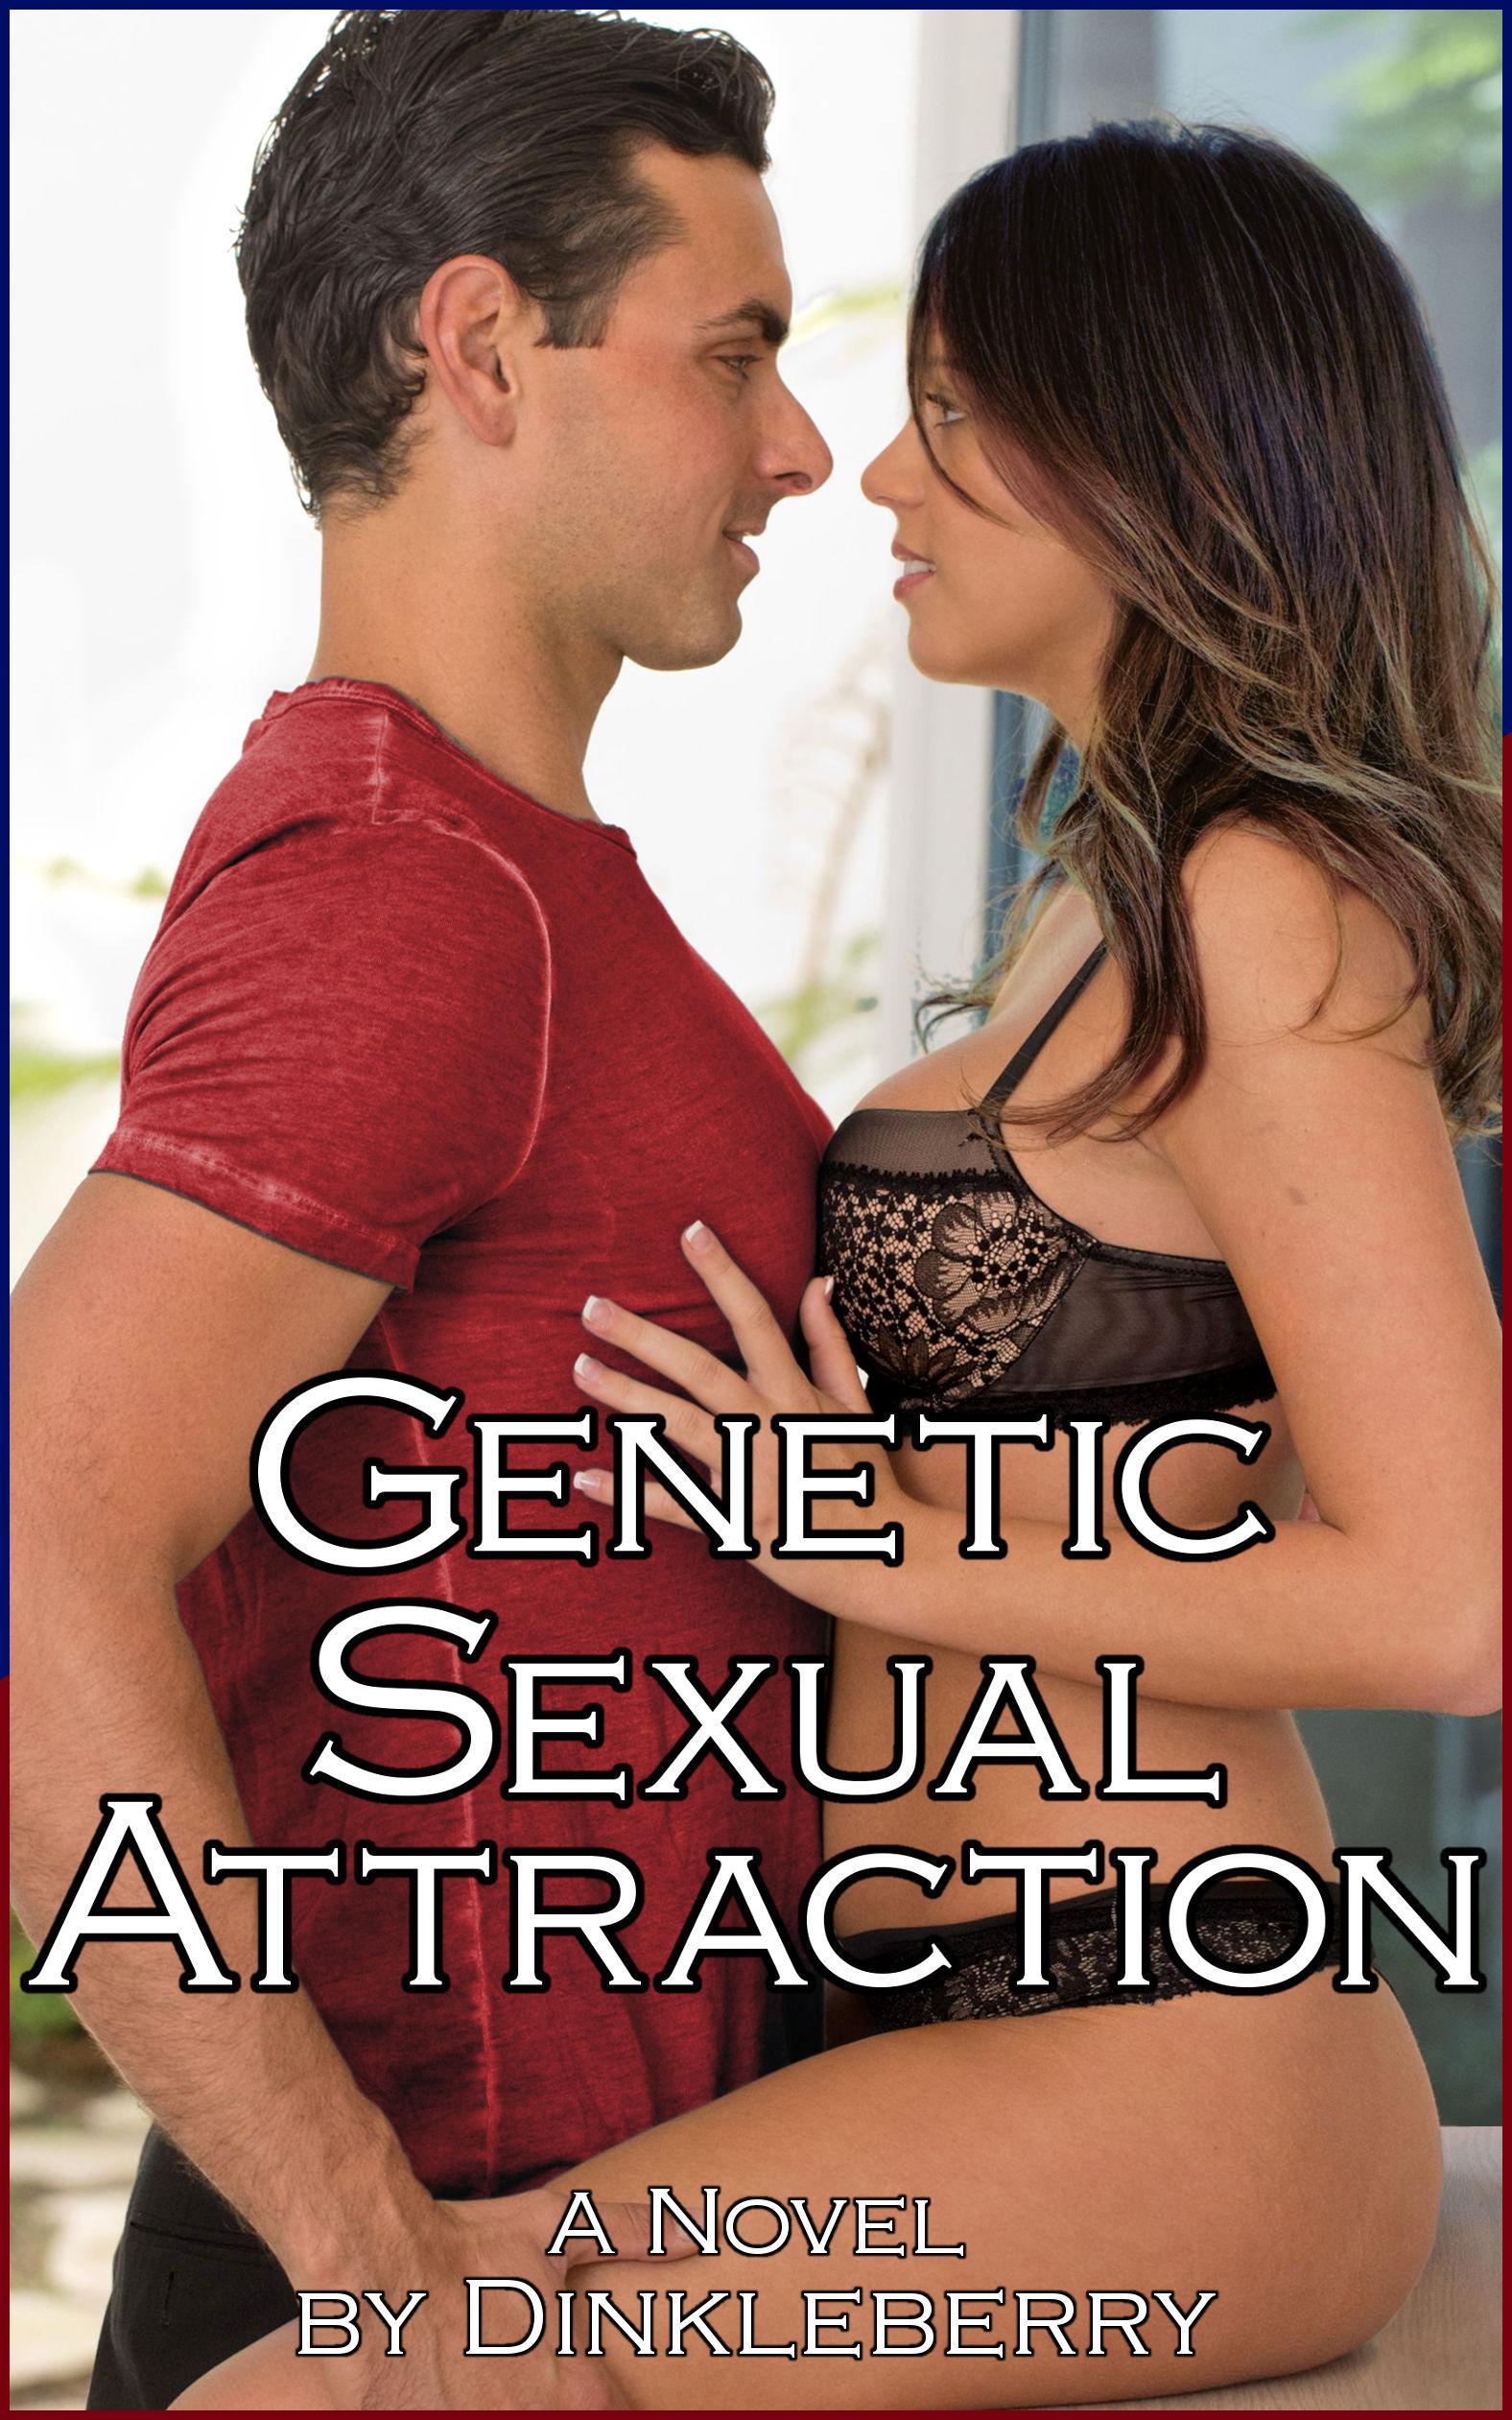 Genetic sexual attractions